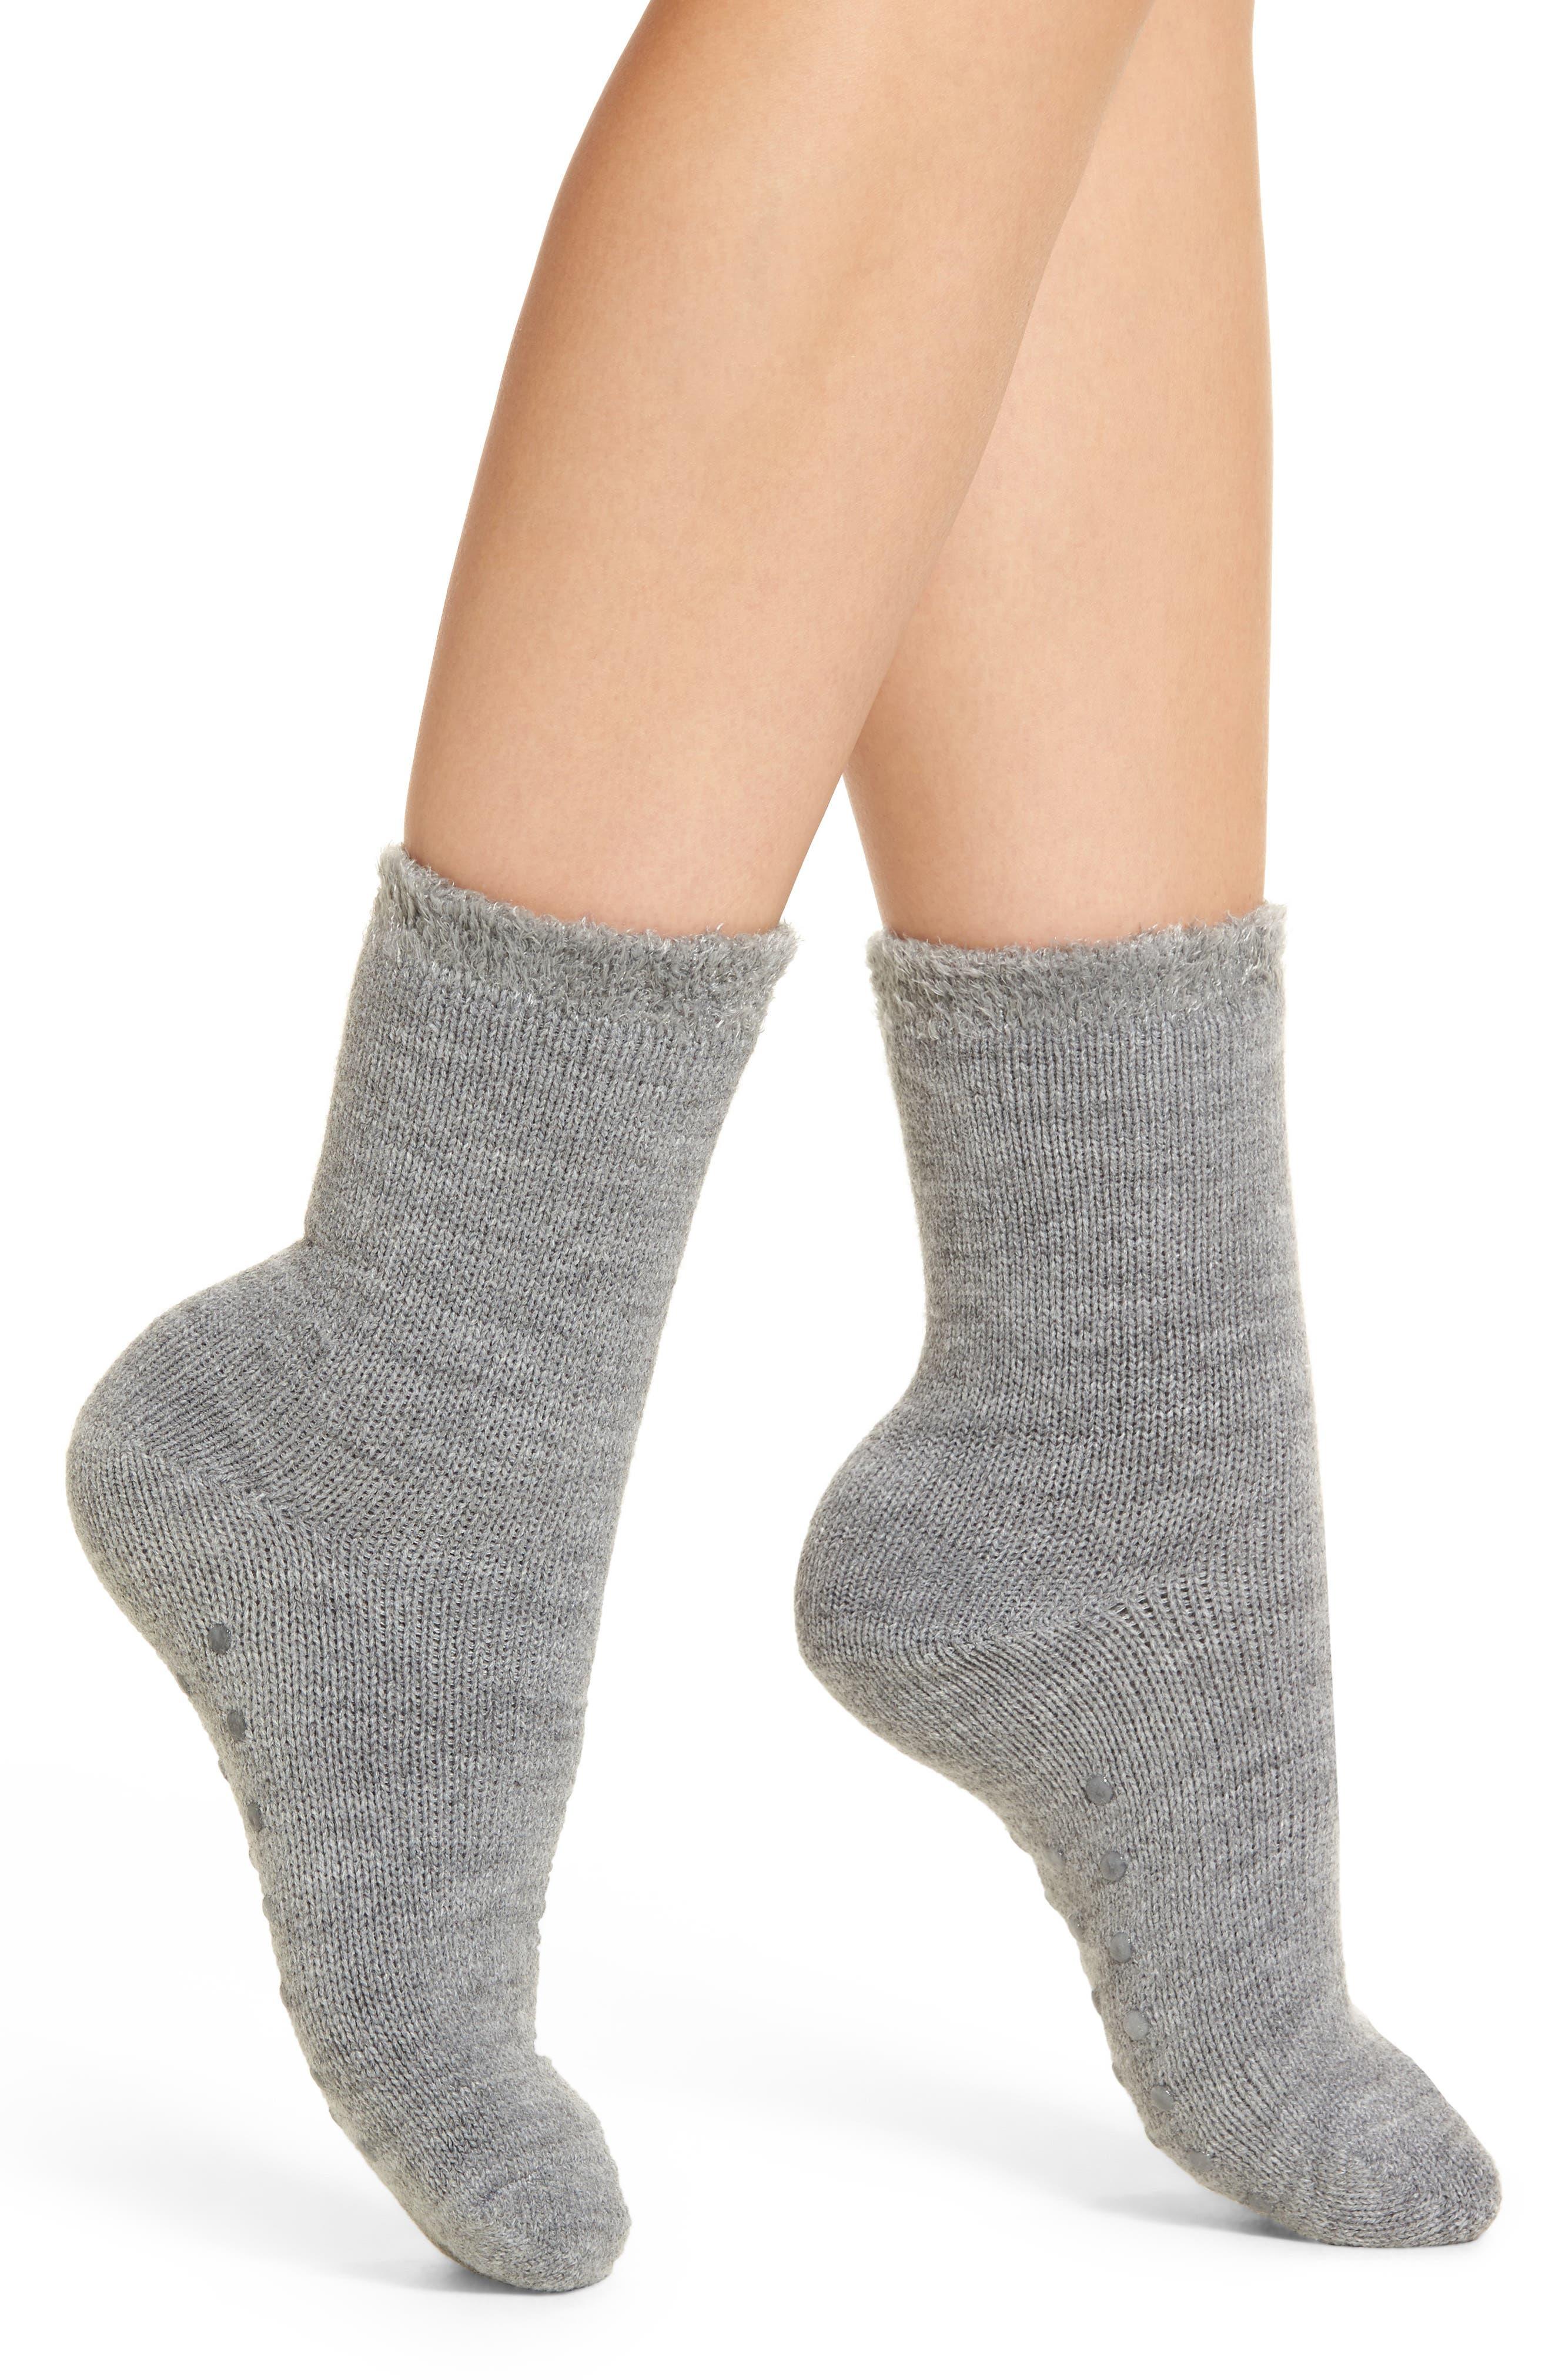 Nordstrom Butter Cuff Socks